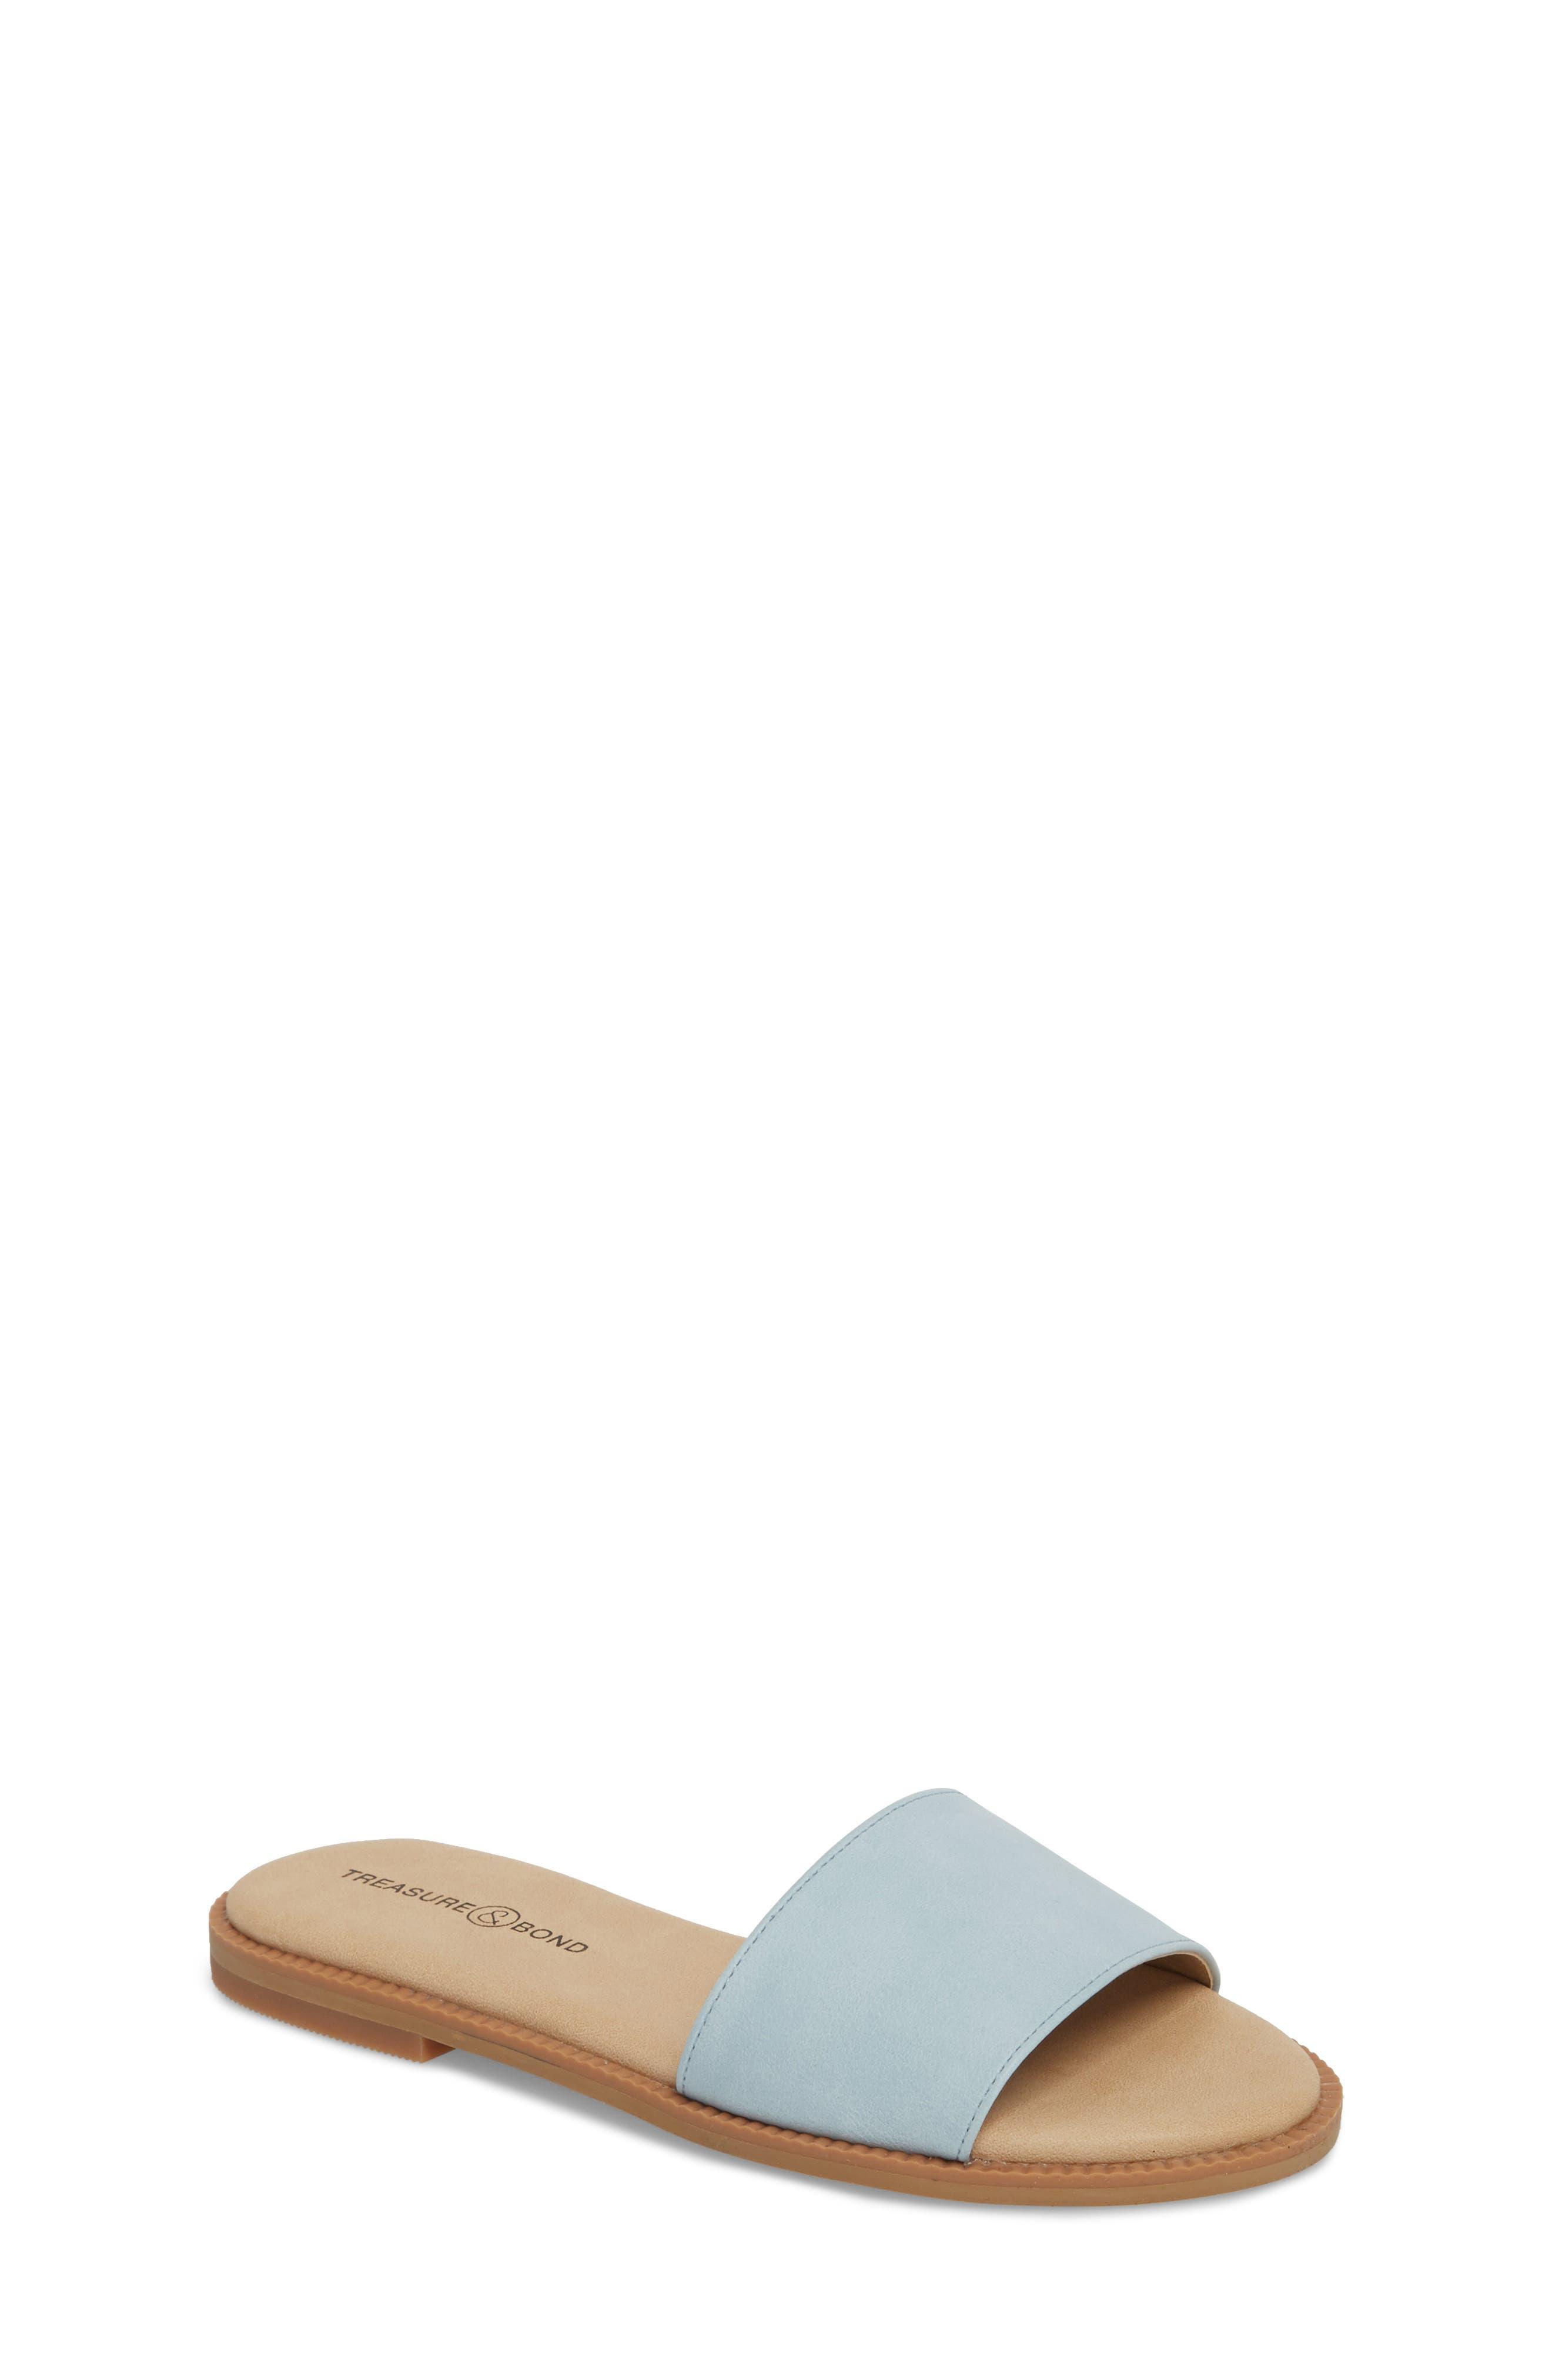 Mia Slide Sandal,                         Main,                         color,